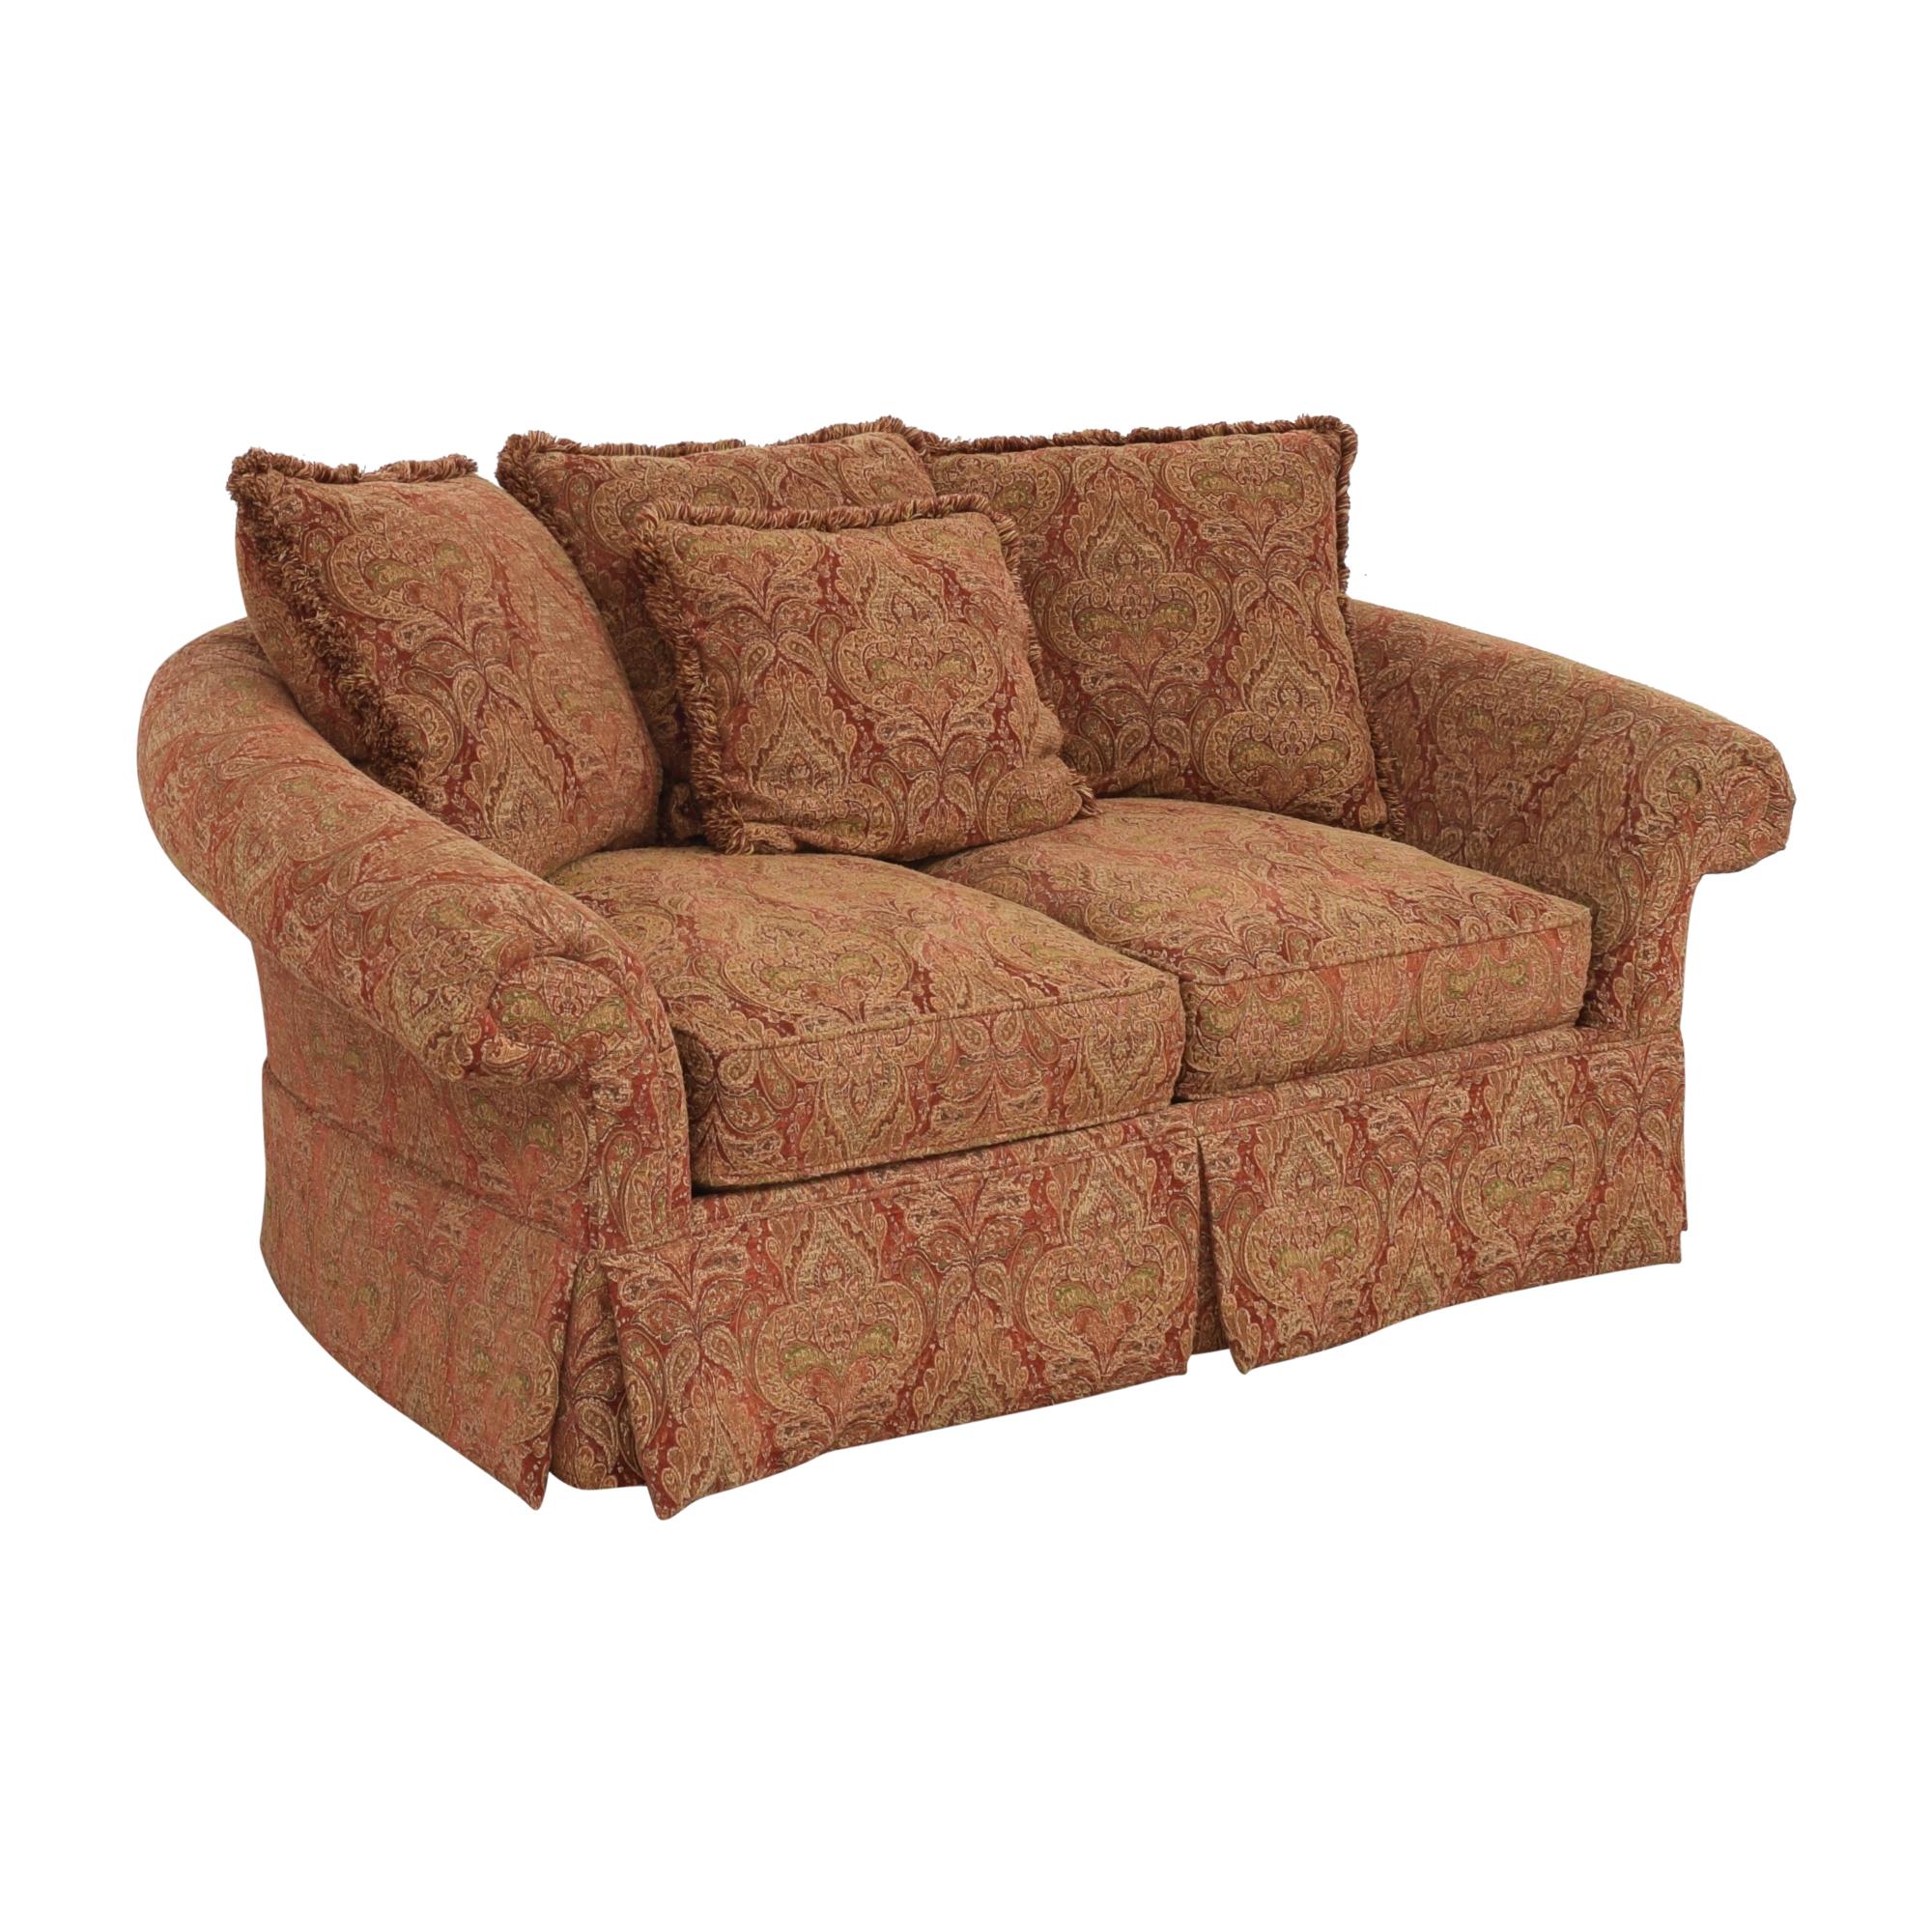 buy Raymour & Flanigan Two Cushion Skirted Sofa Raymour & Flanigan Sofas